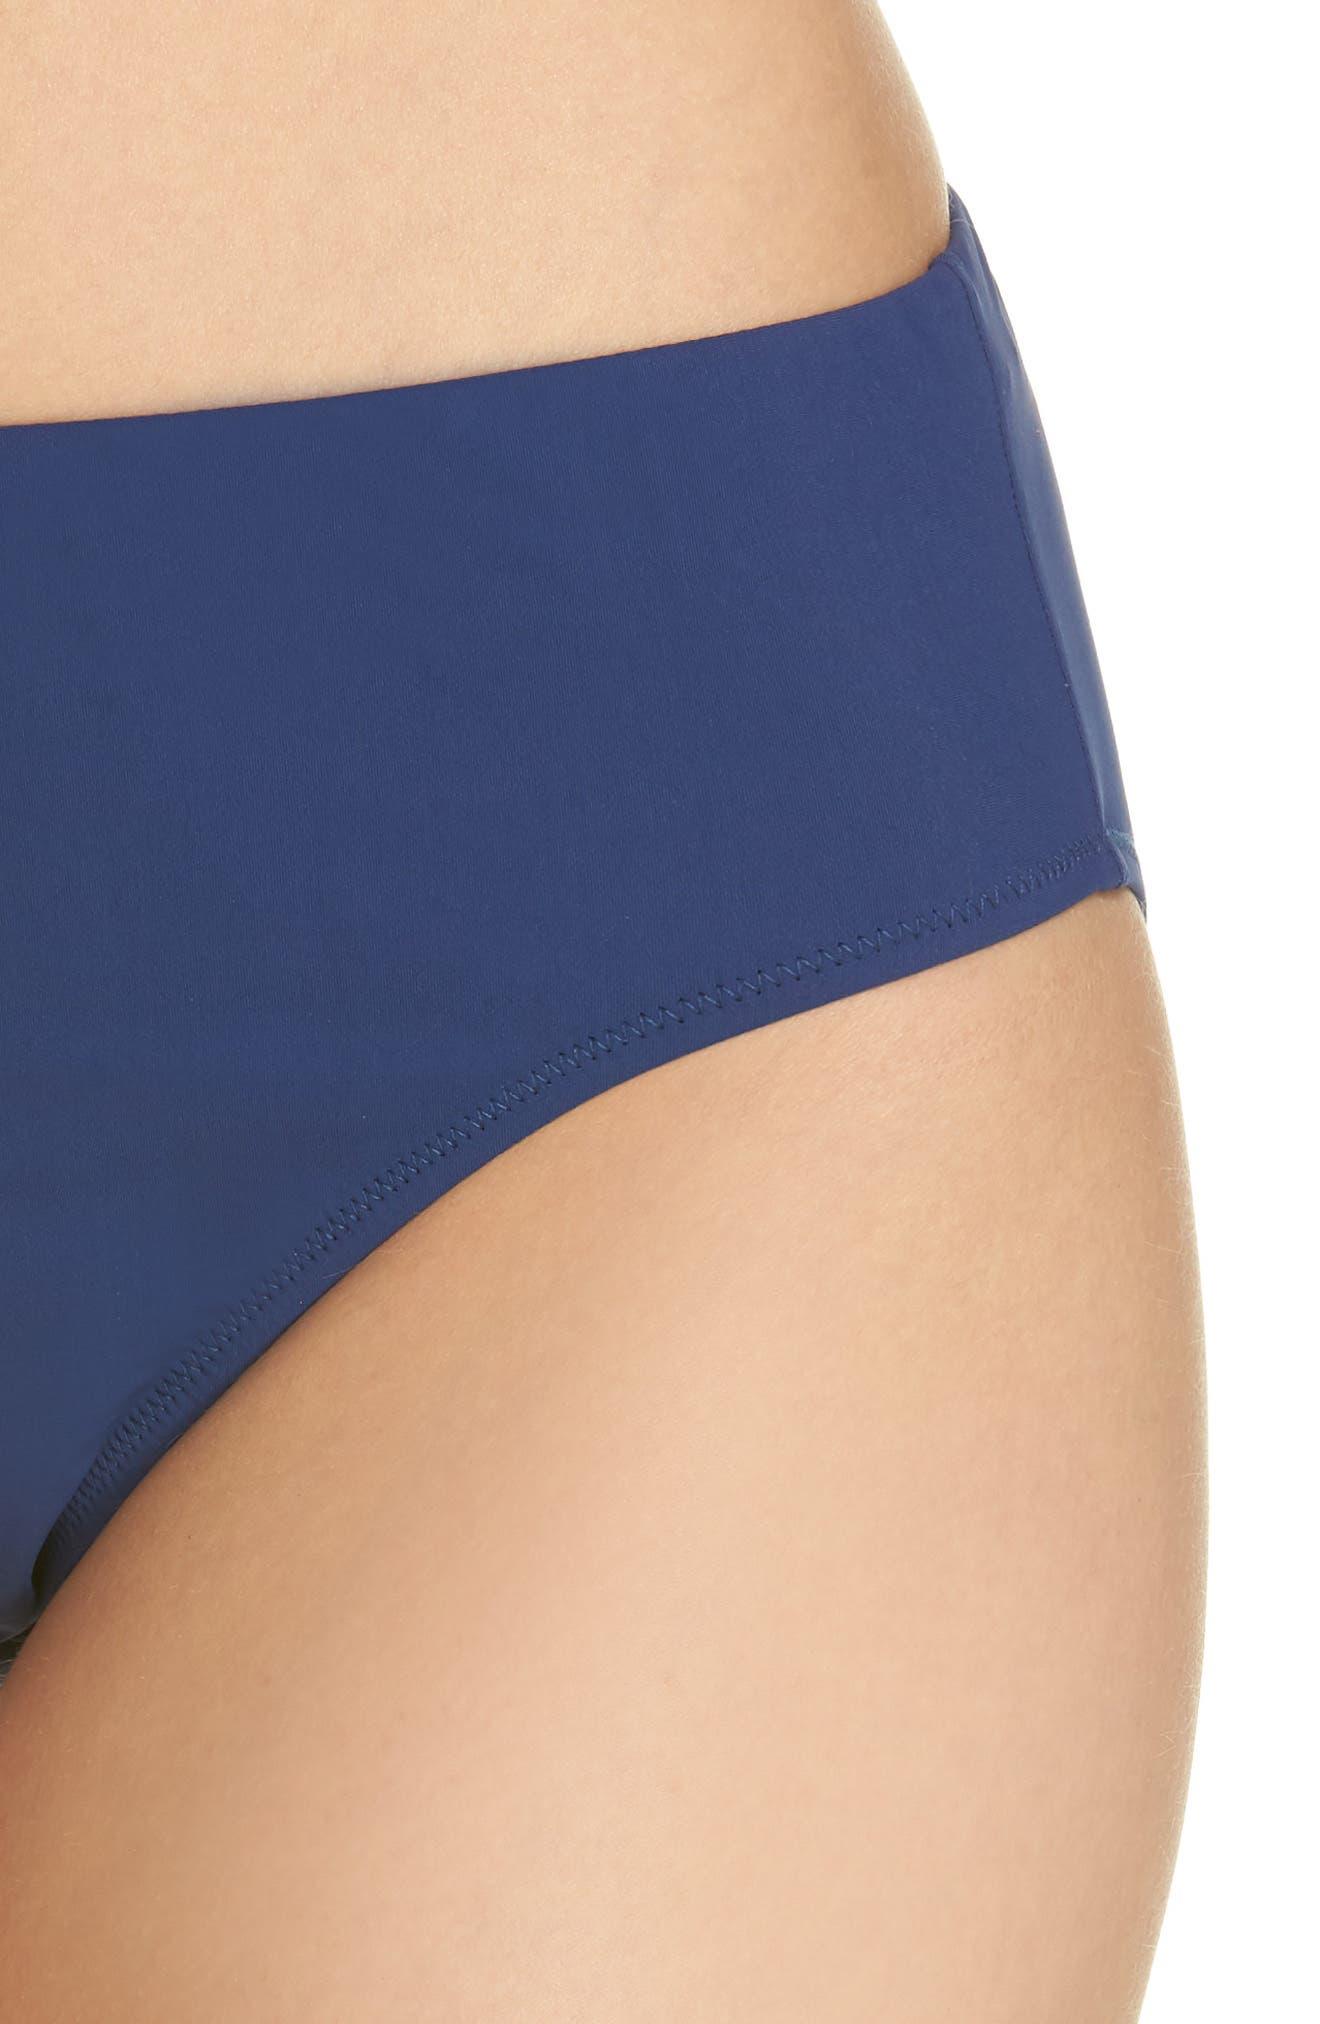 Hipster Bikini Bottoms,                             Alternate thumbnail 4, color,                             427